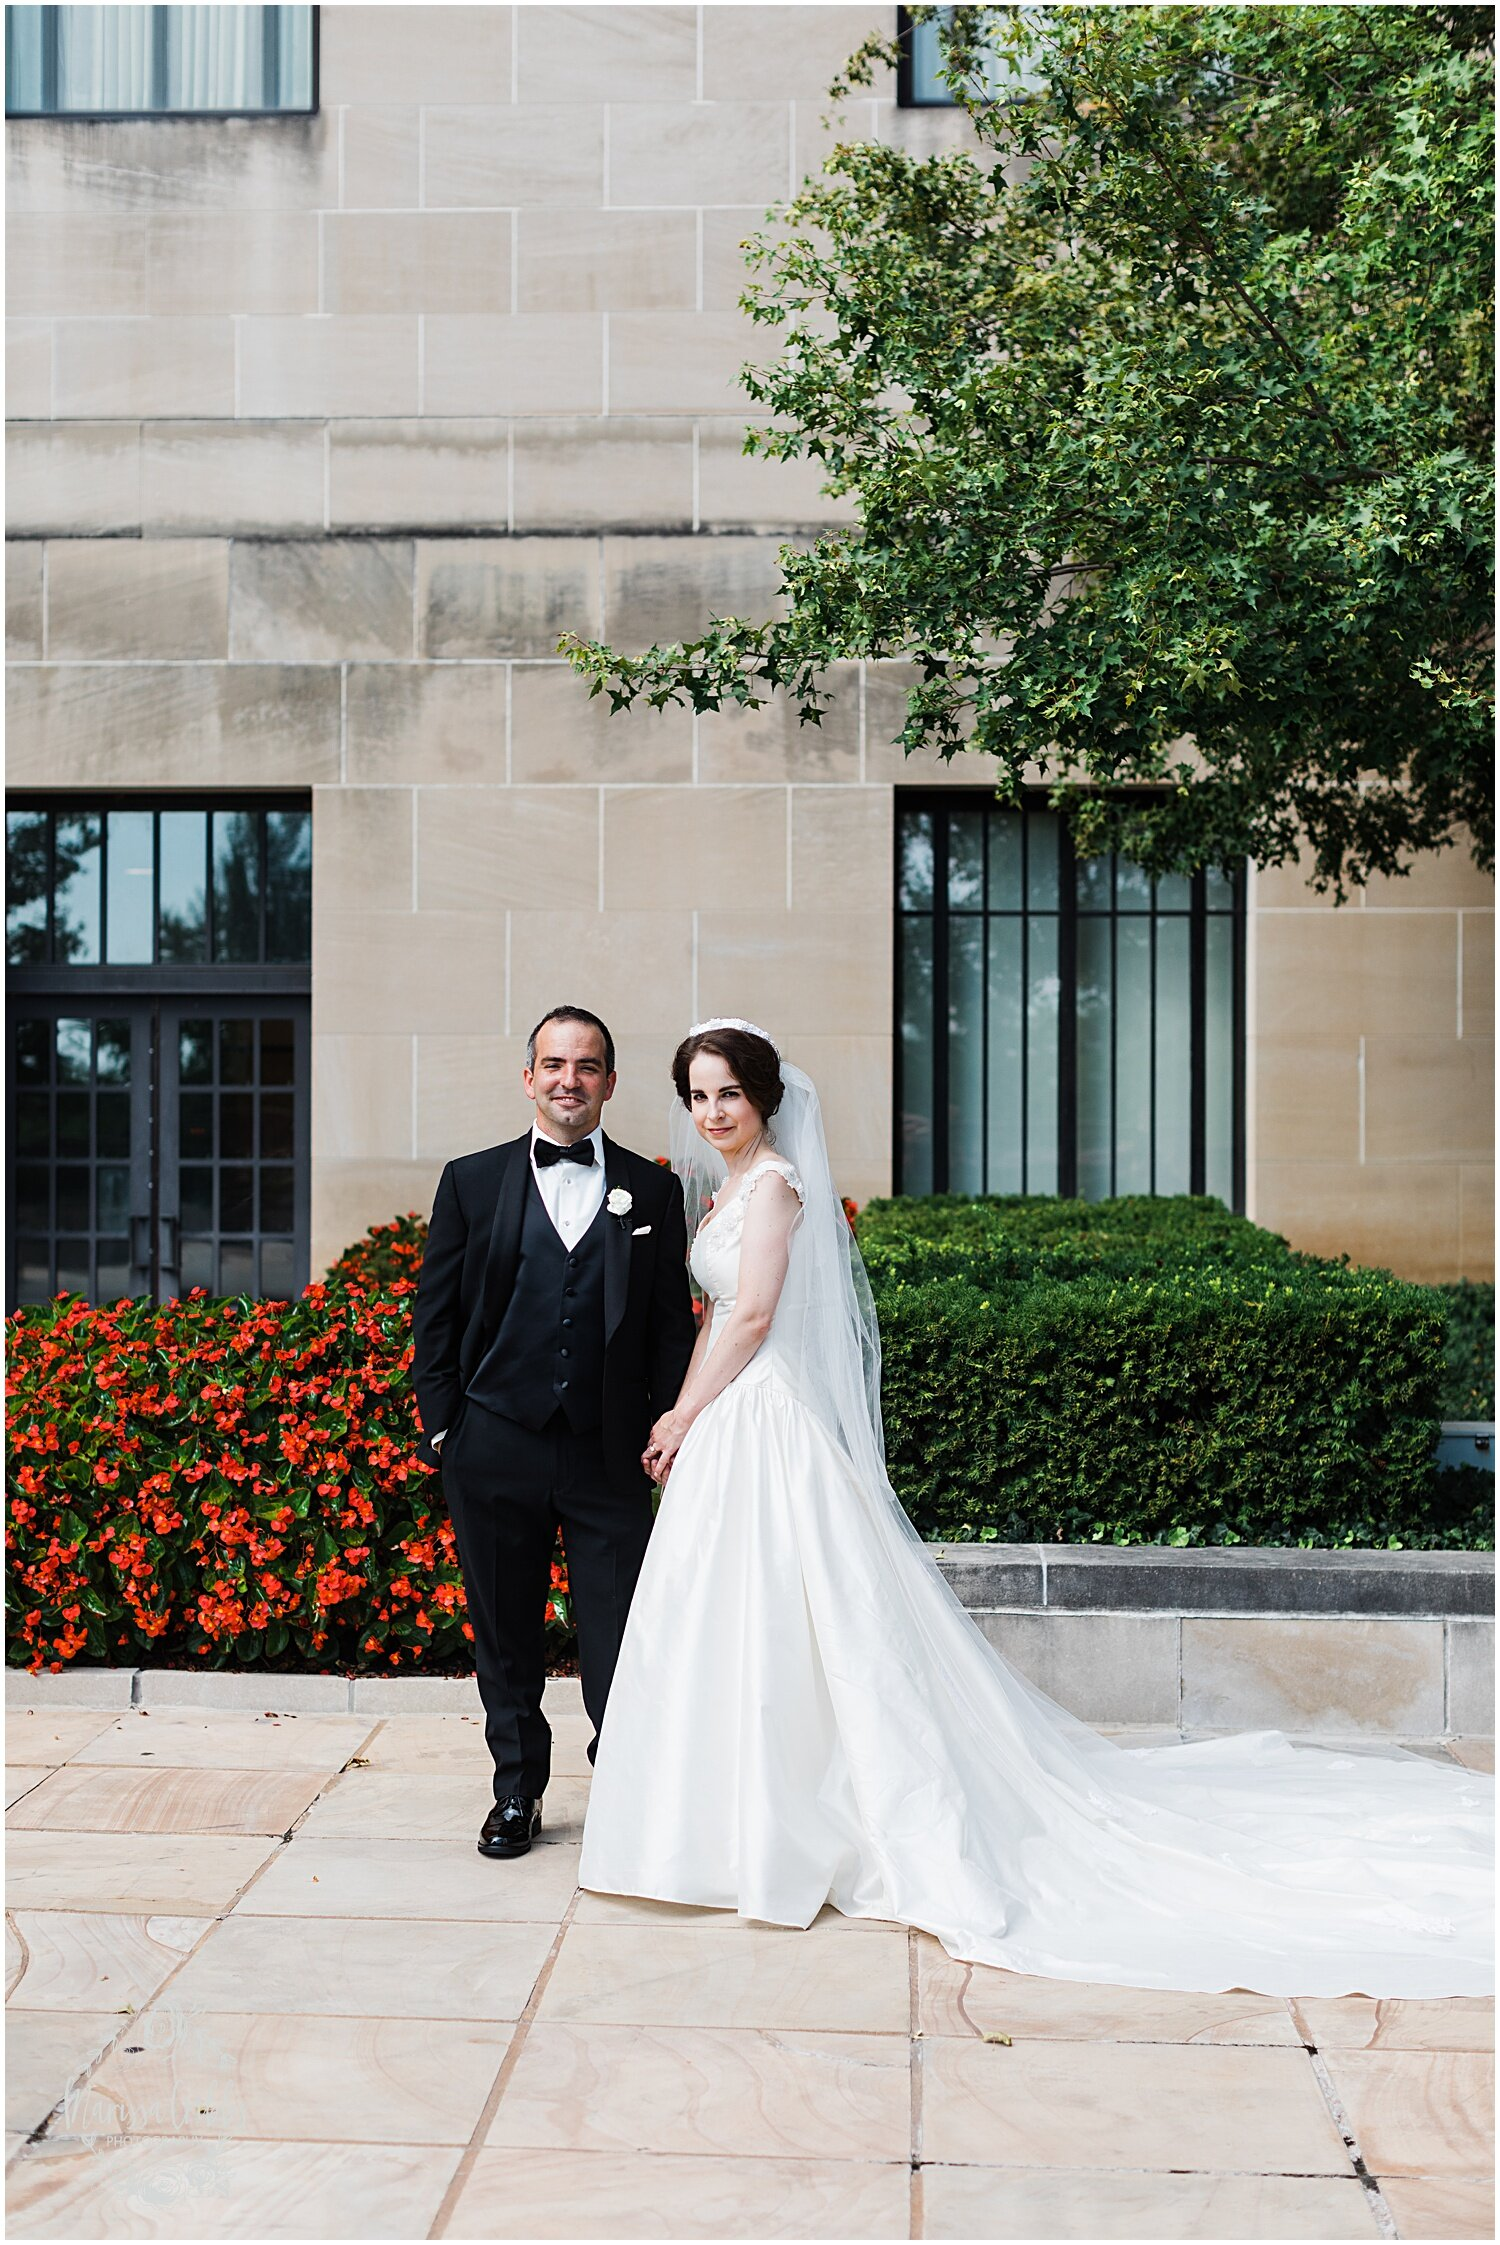 TYLER & CAROLINE MARRIED BLOG | MARISSA CRIBBS PHOTOGRAPHY | THE CARRIAGE CLUB | KANSAS CITY WEDDING PHOTOS_9257.jpg